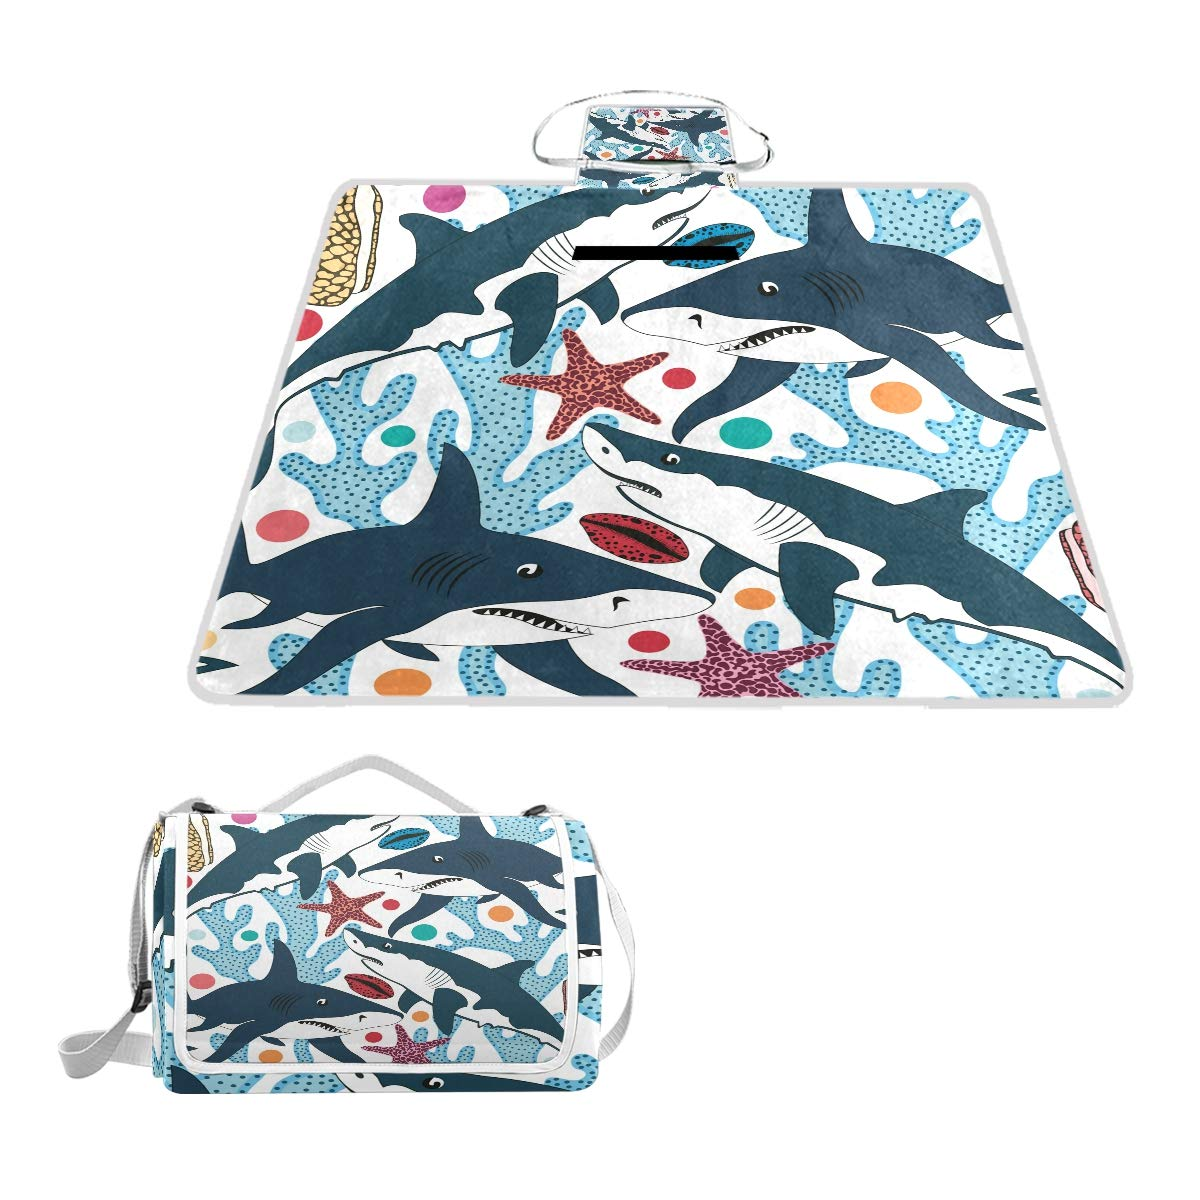 Anyangquji Sharks Shells Picnic Blanket 57''x59''